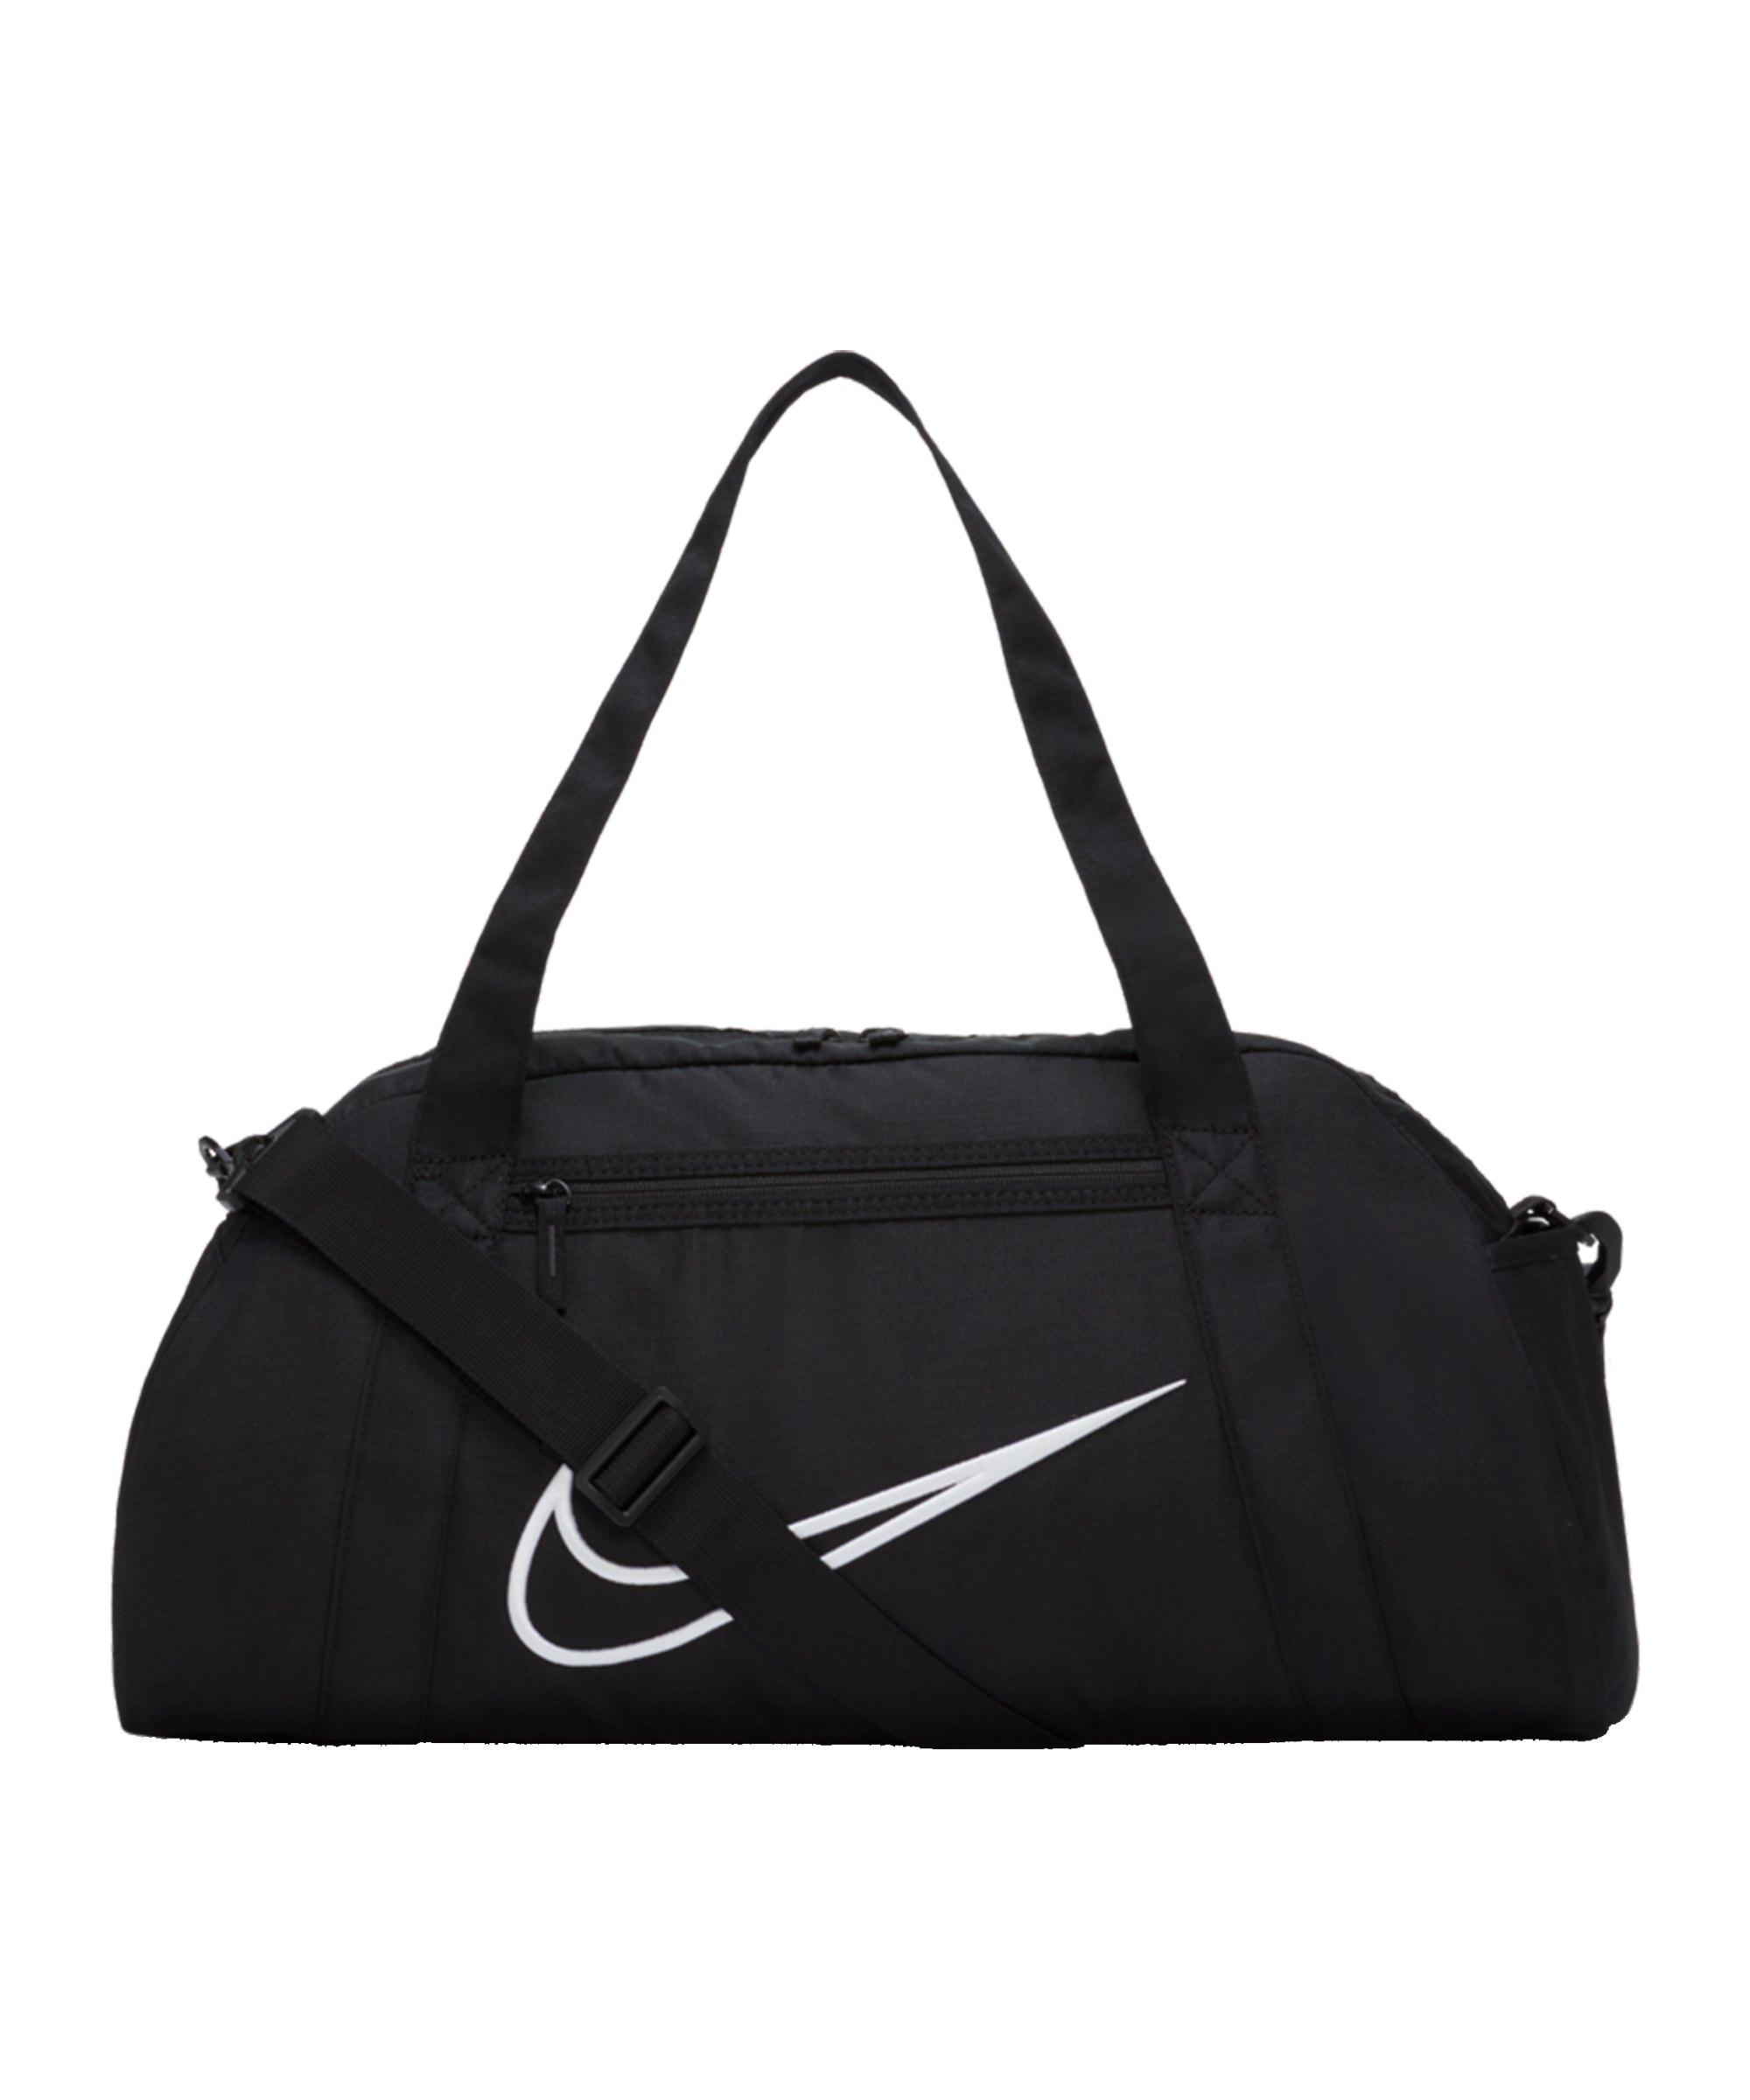 Nike Gym Club Duffel Tasche Schwarz F010 - schwarz